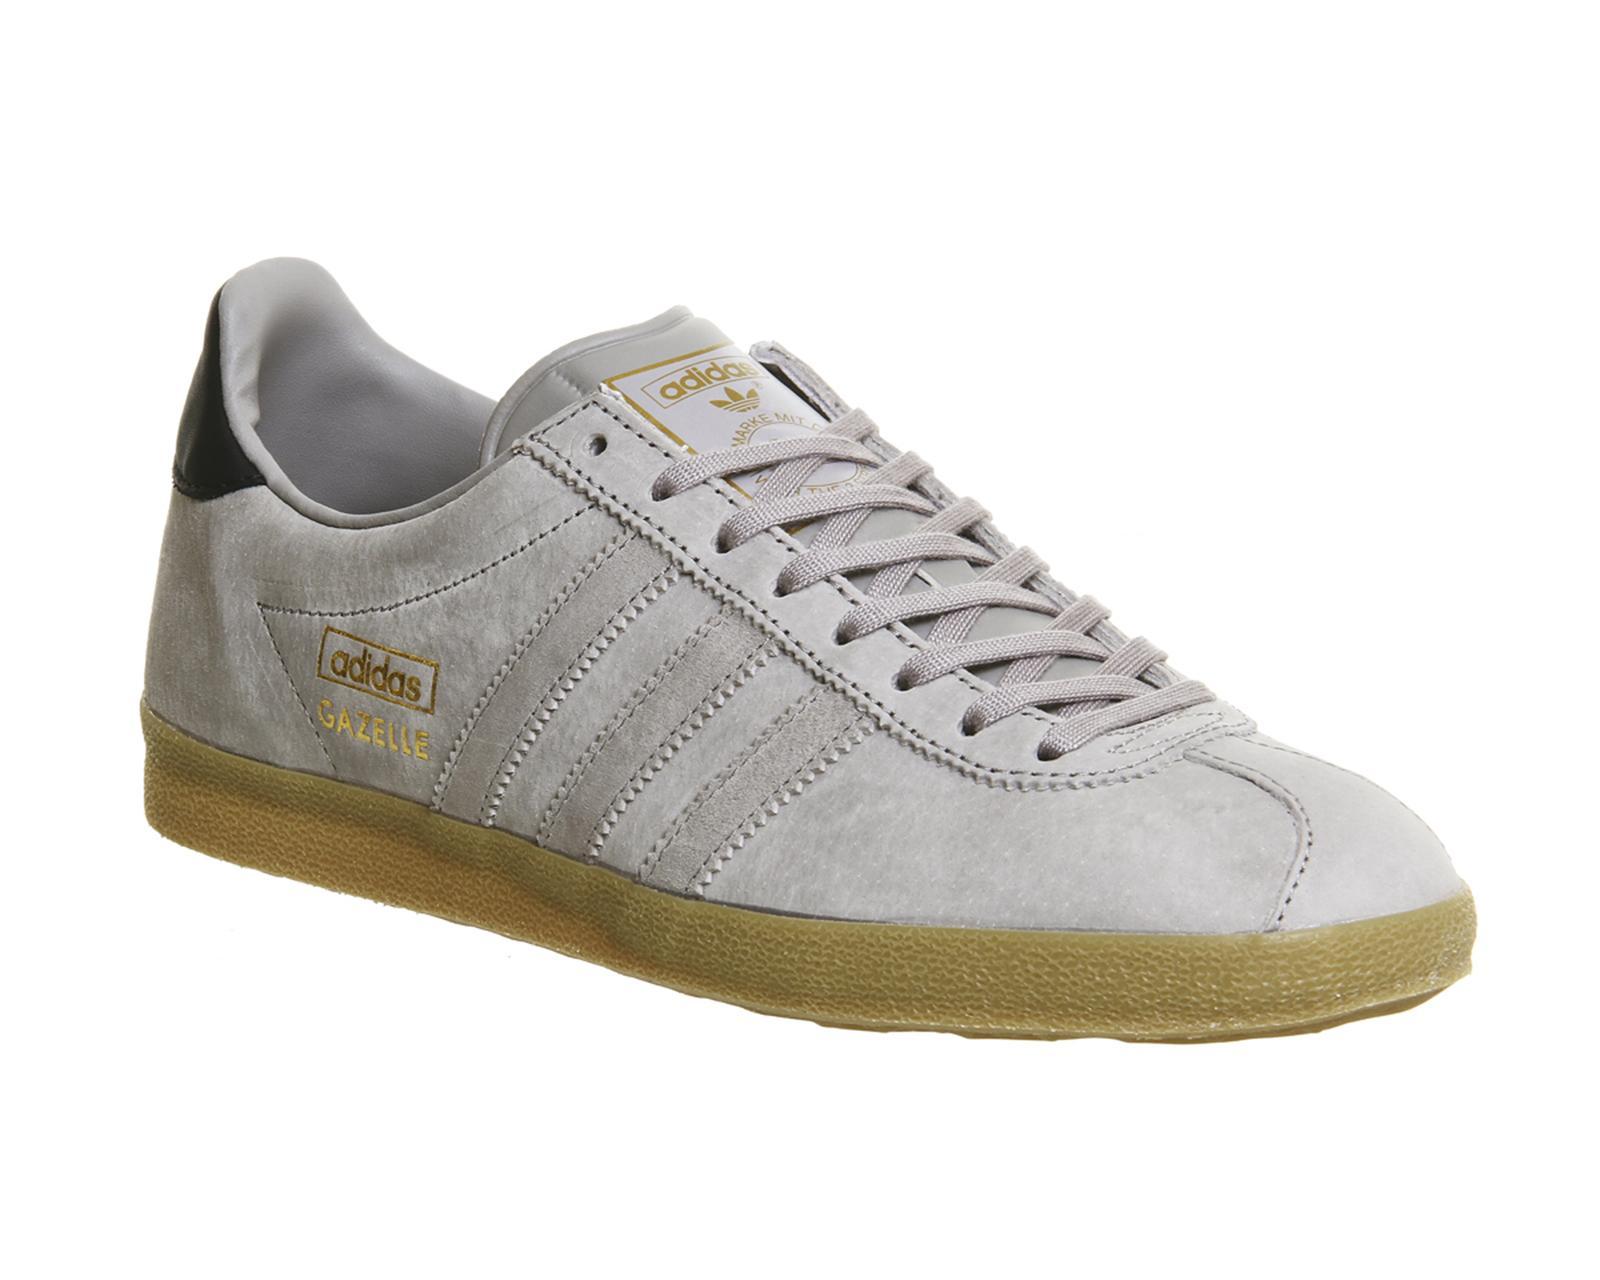 Lyst - adidas Originals Gazelle Og in Gray for Men 3054c767c